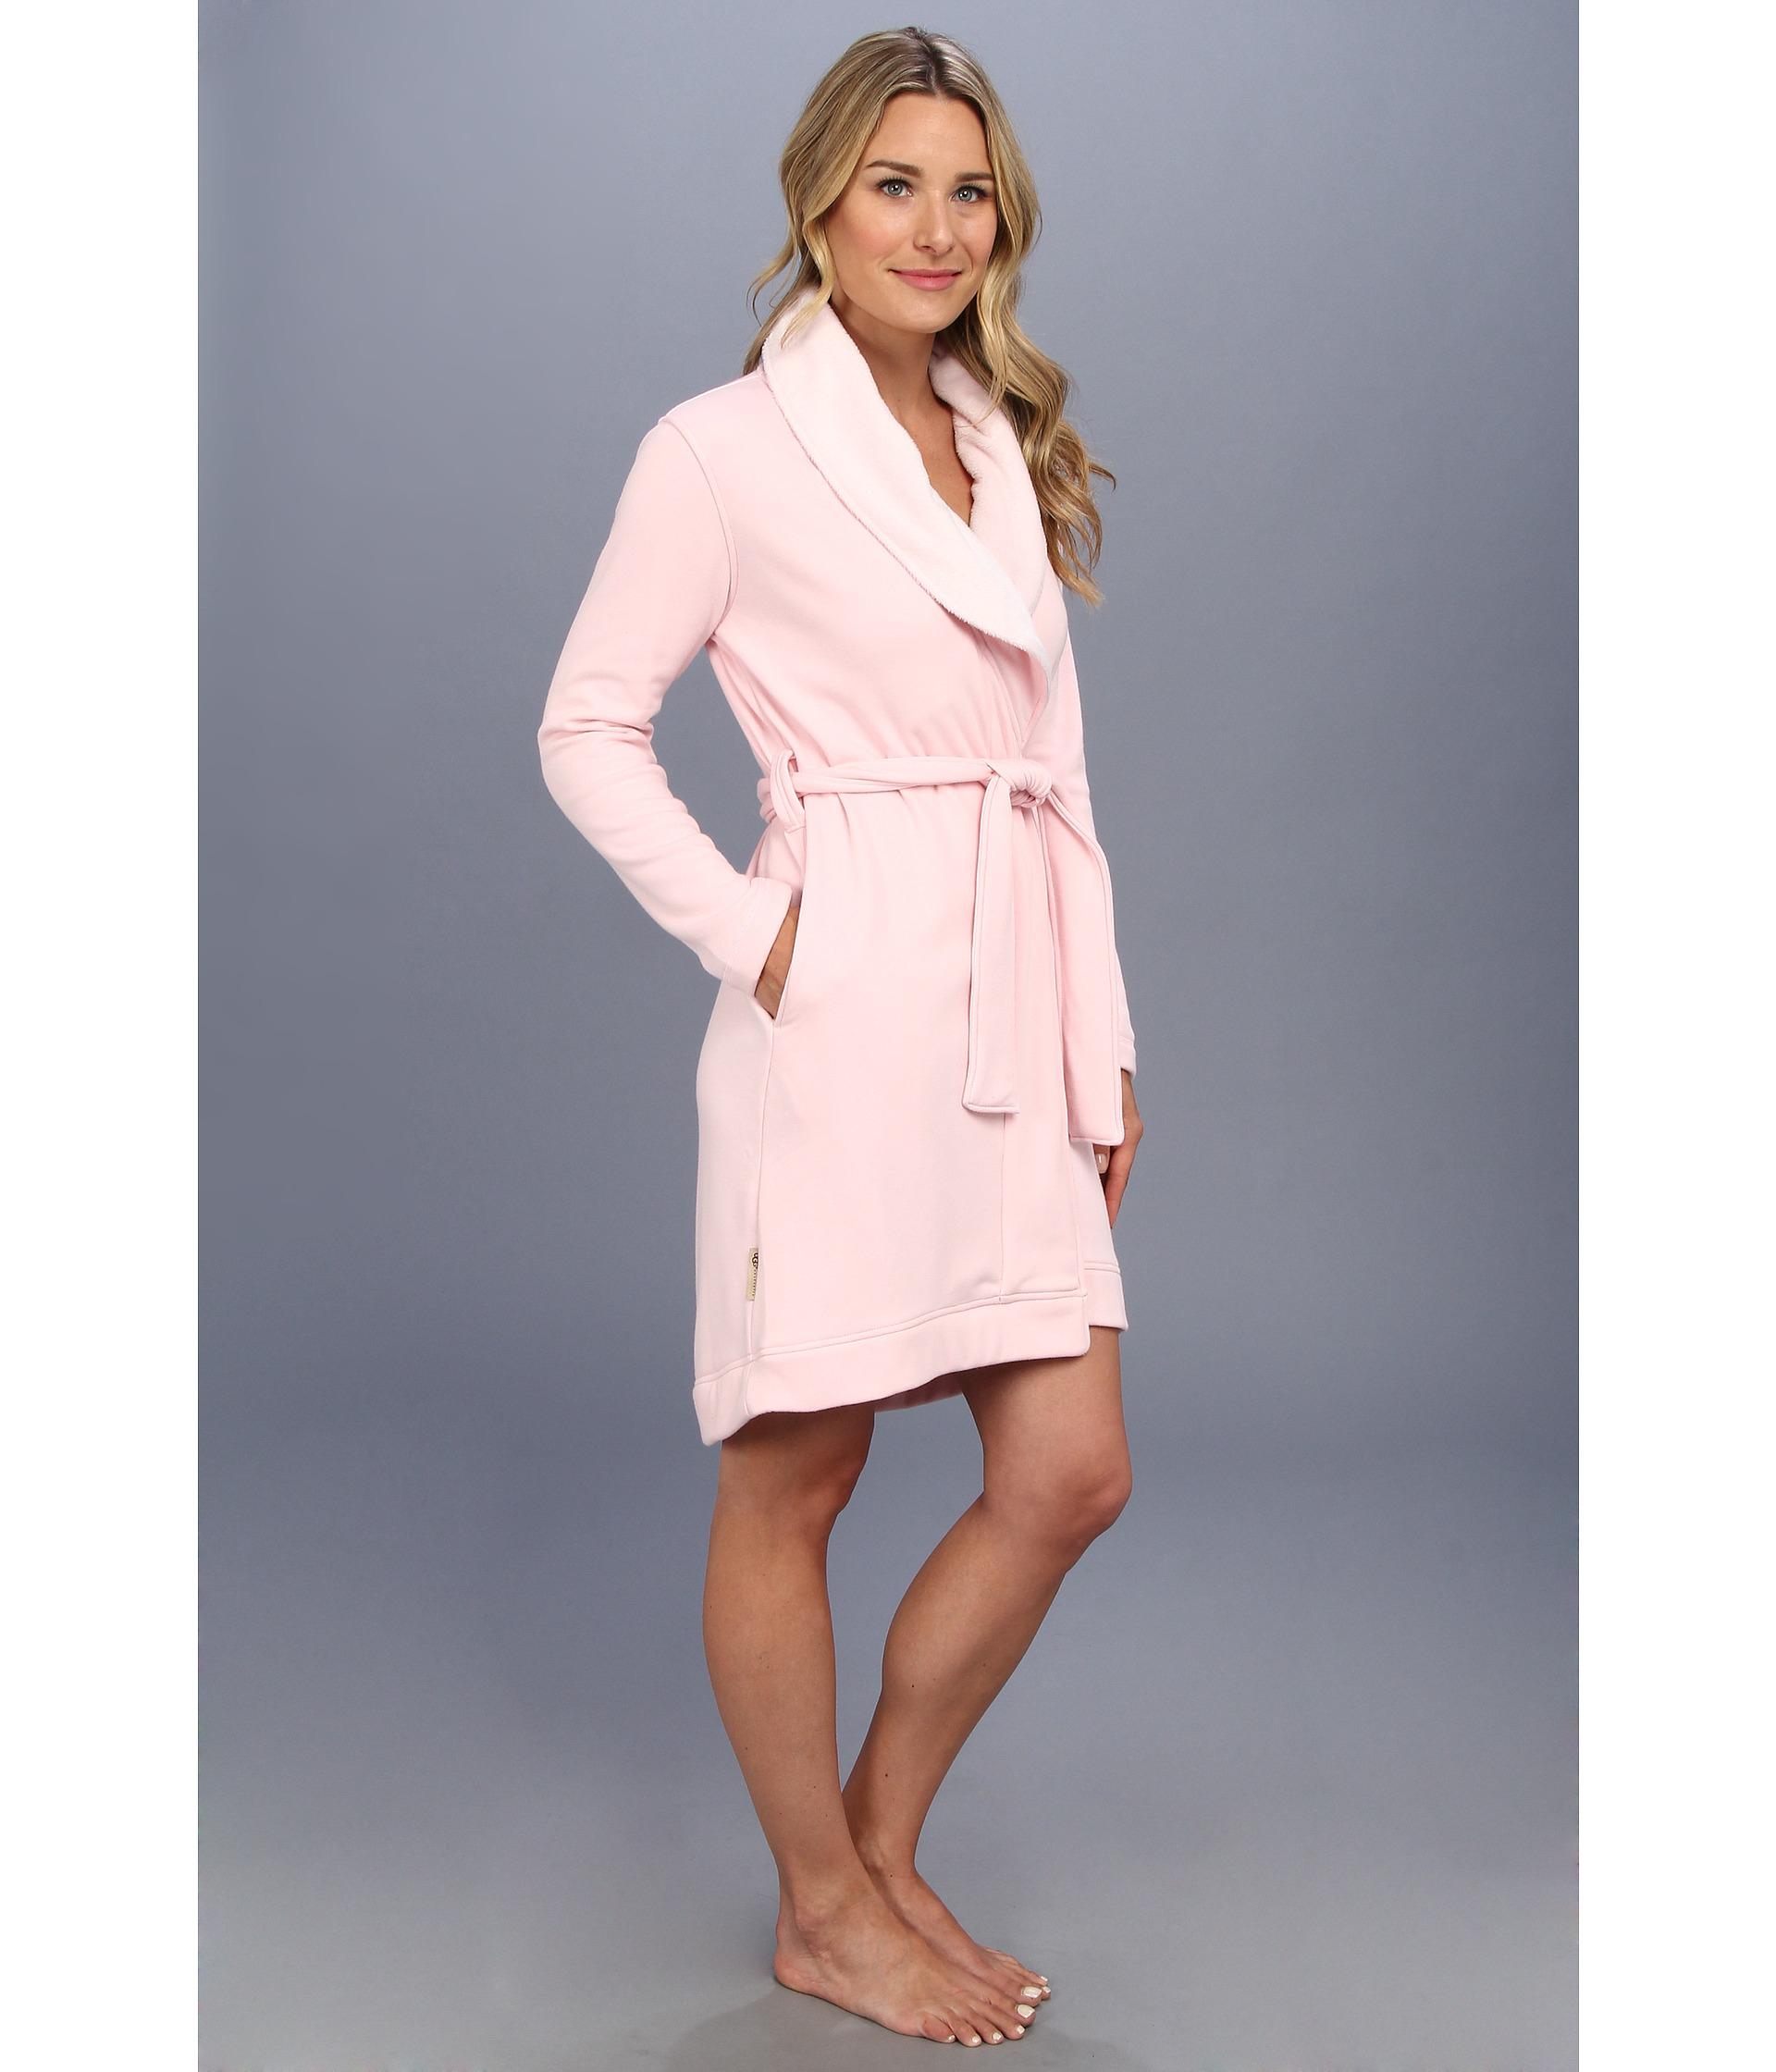 Lyst - UGG Blanche Robe in Pink 88de5b2b2